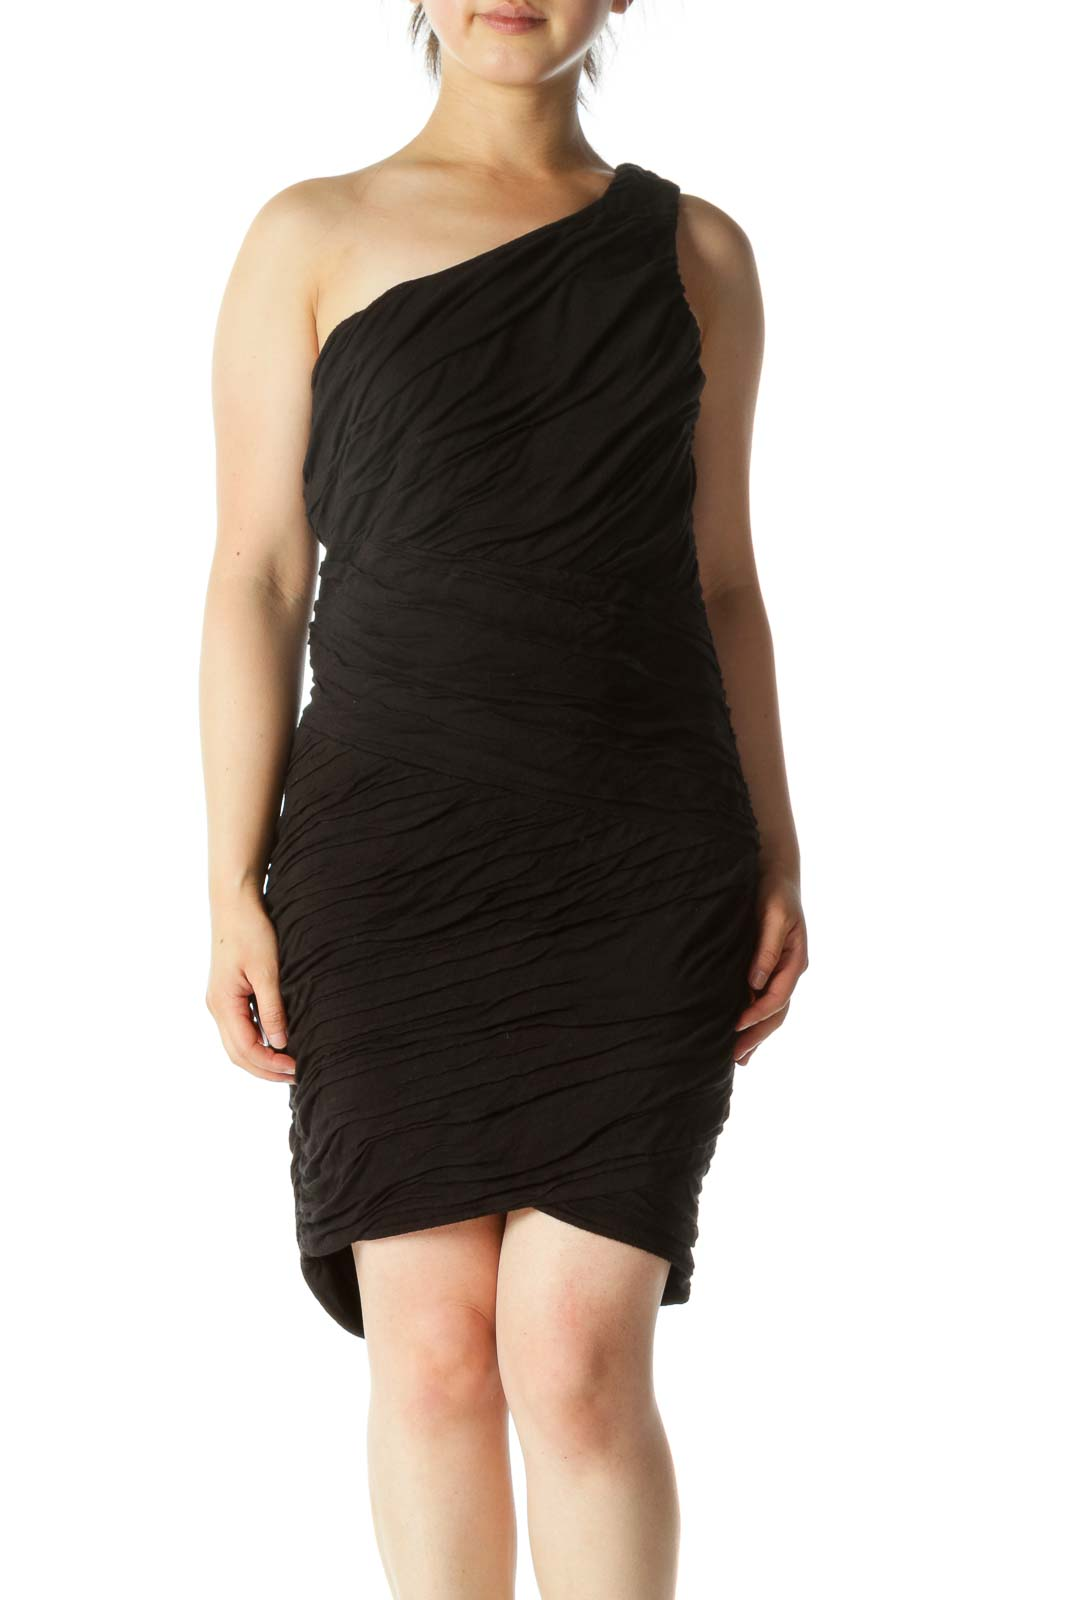 Black One Shoulder Ruched Fitted Dress Front